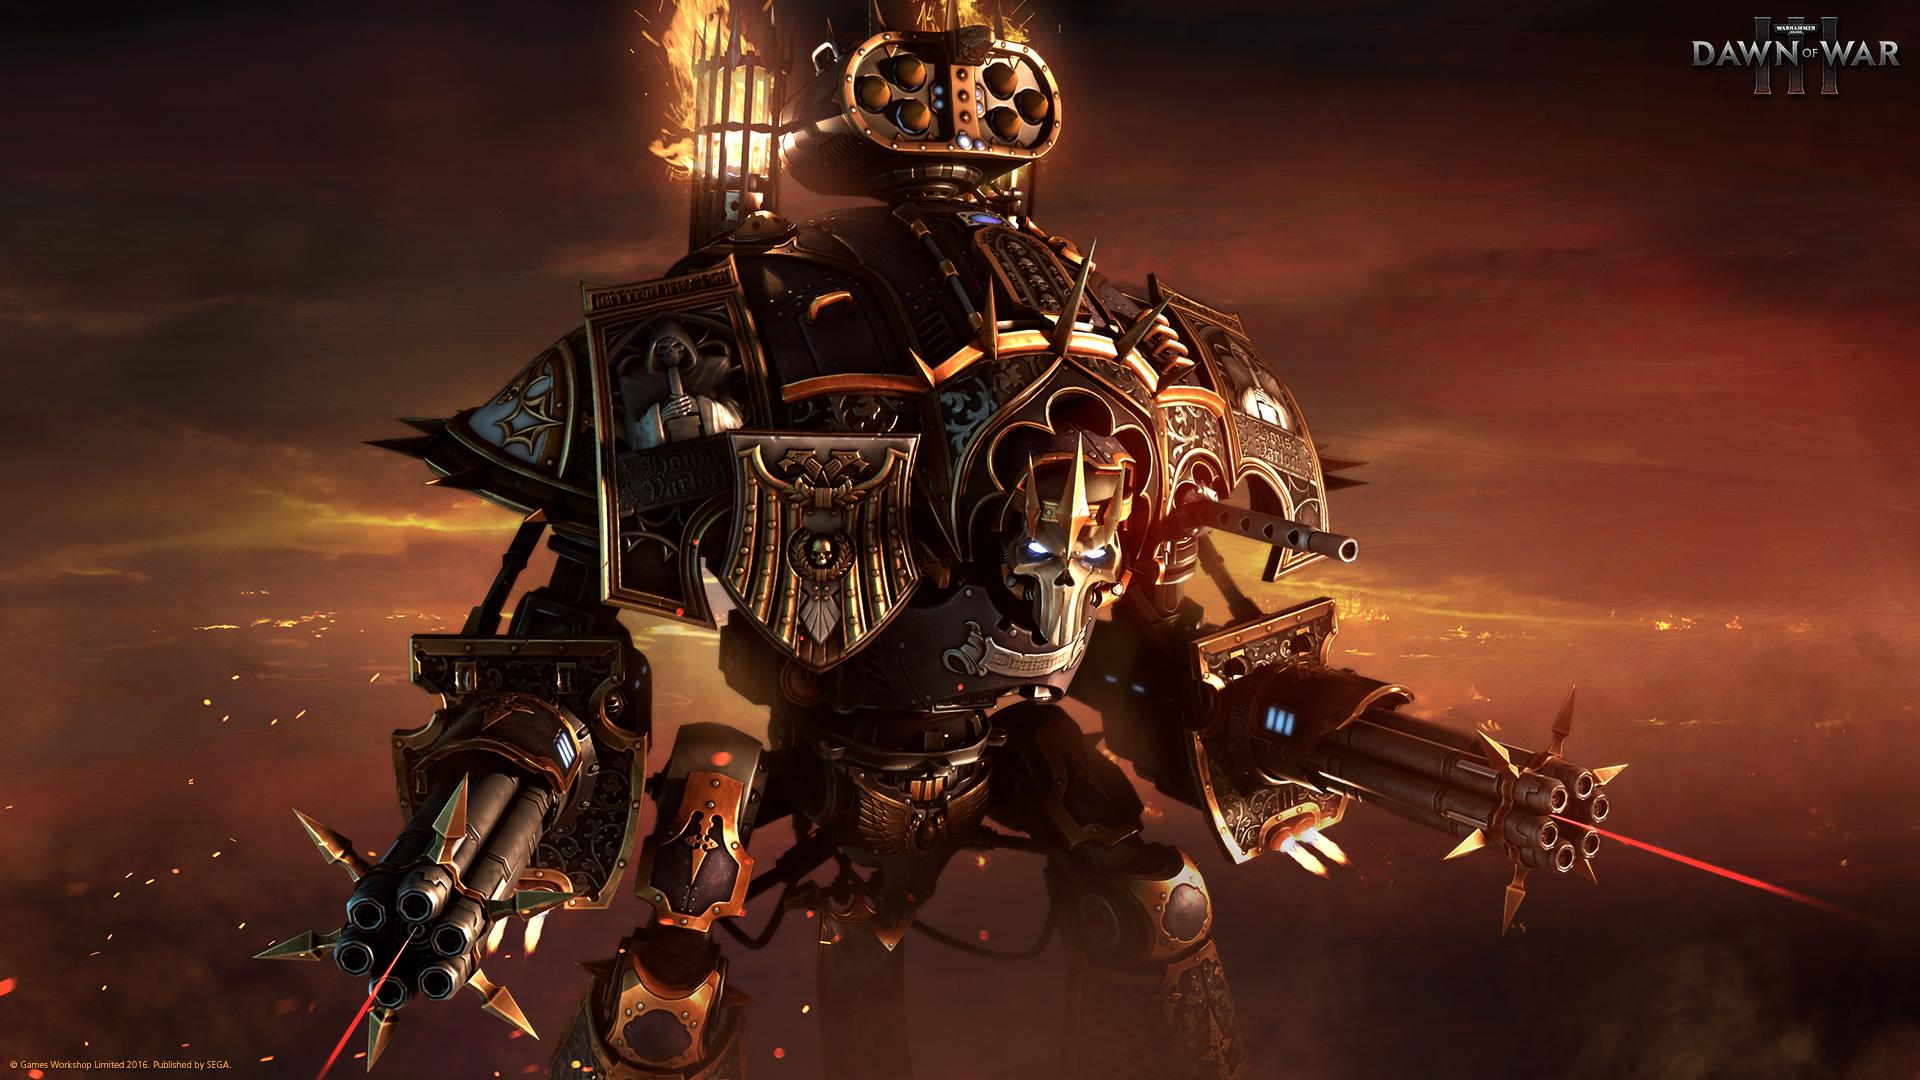 Warhammer 40k Dawn Of War 3 Preview